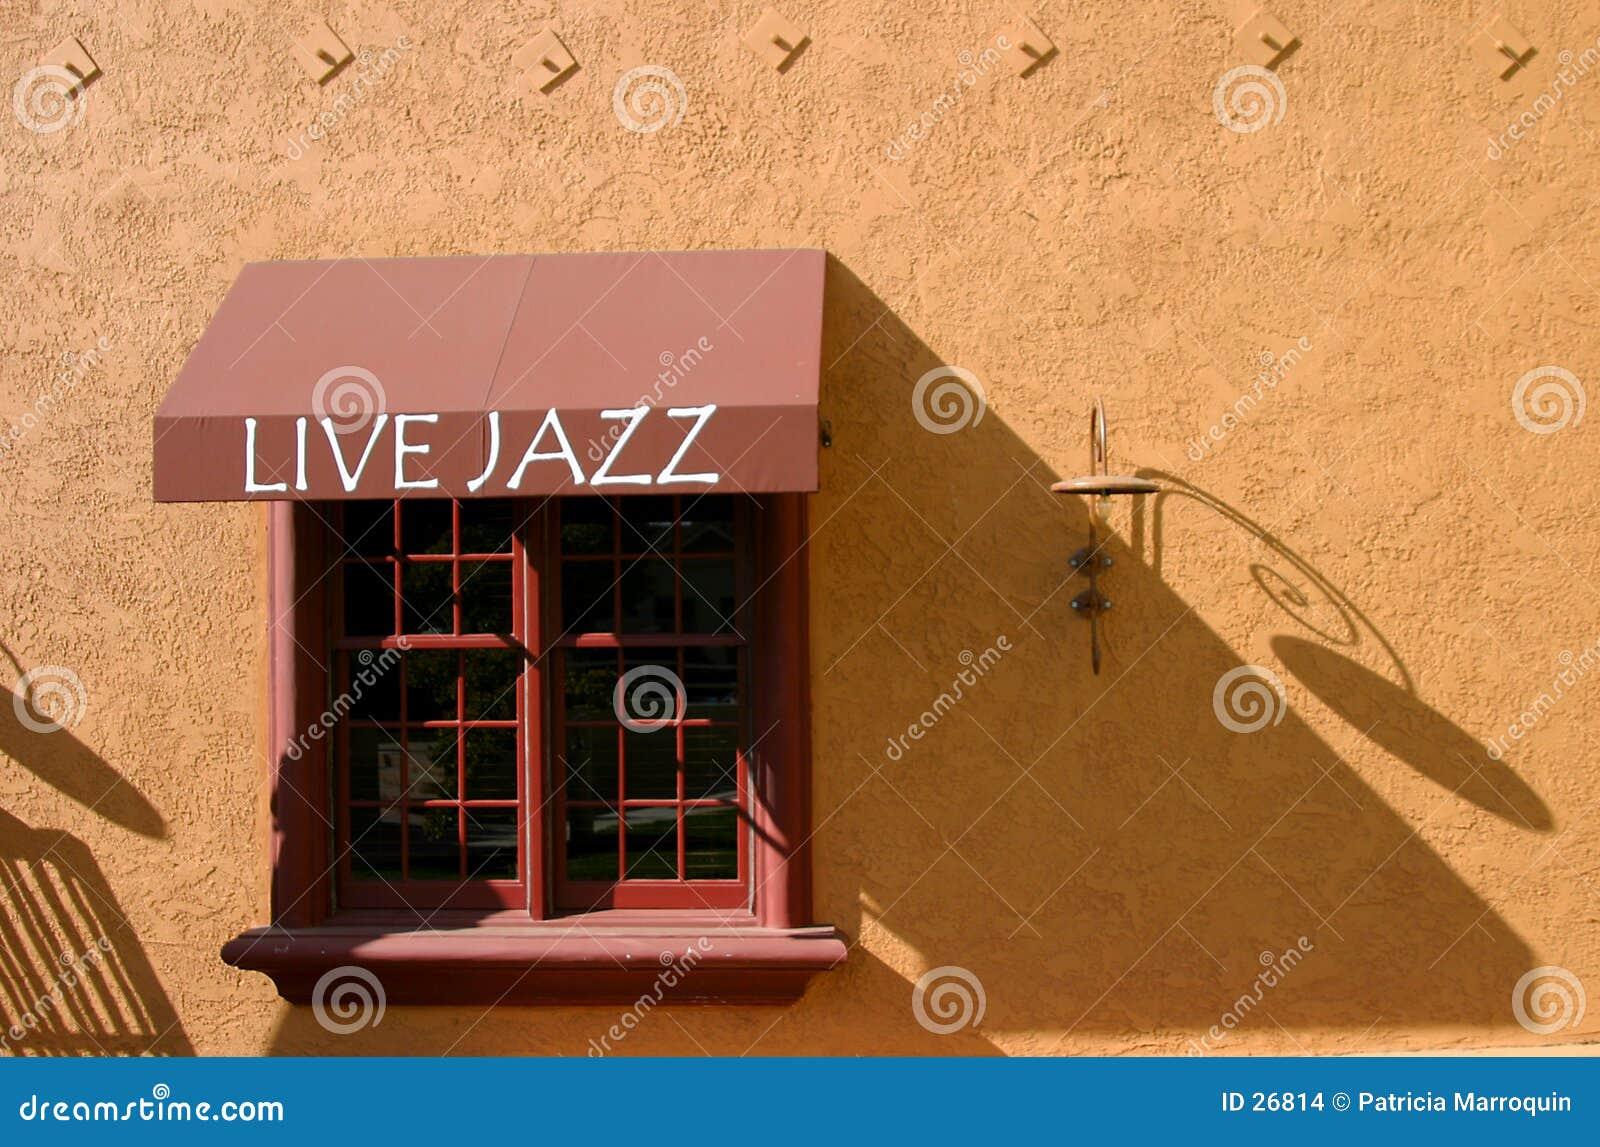 джаз в реальном маштабе времени